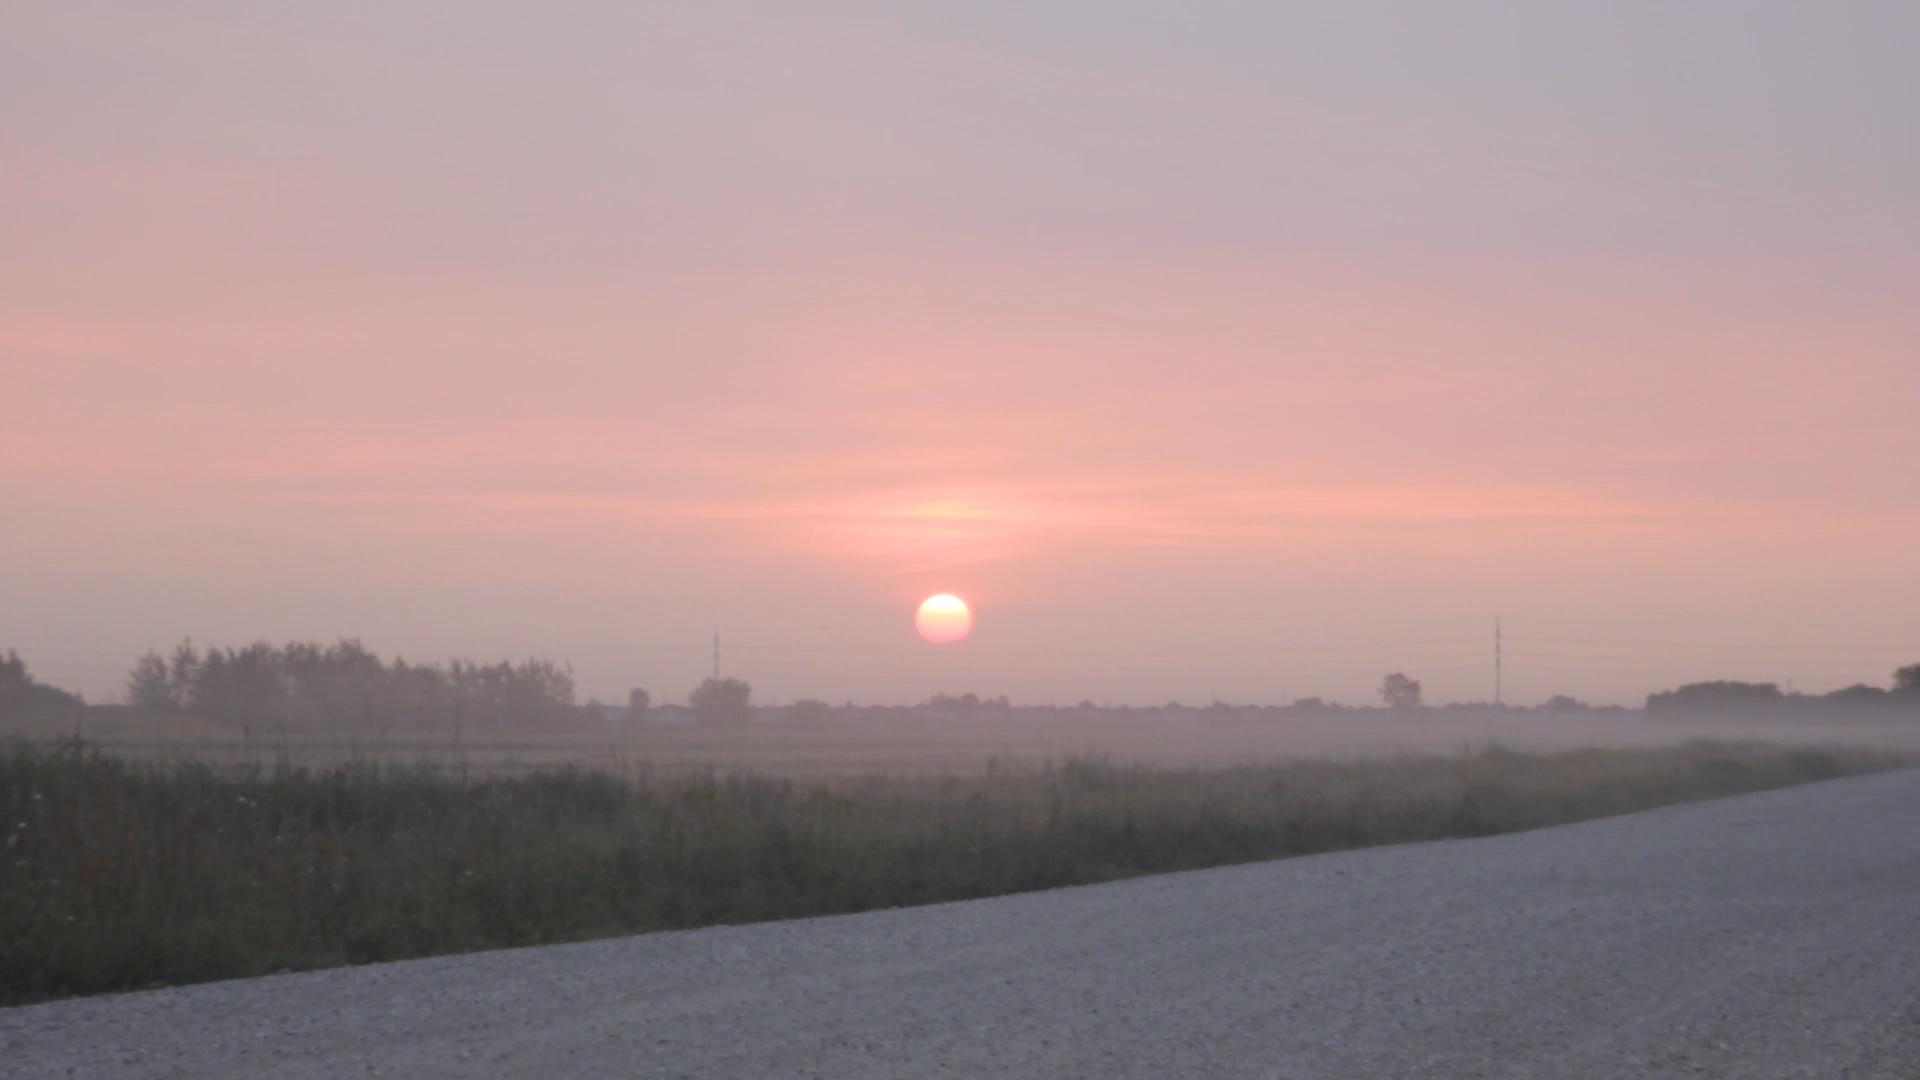 sunrise on the big day